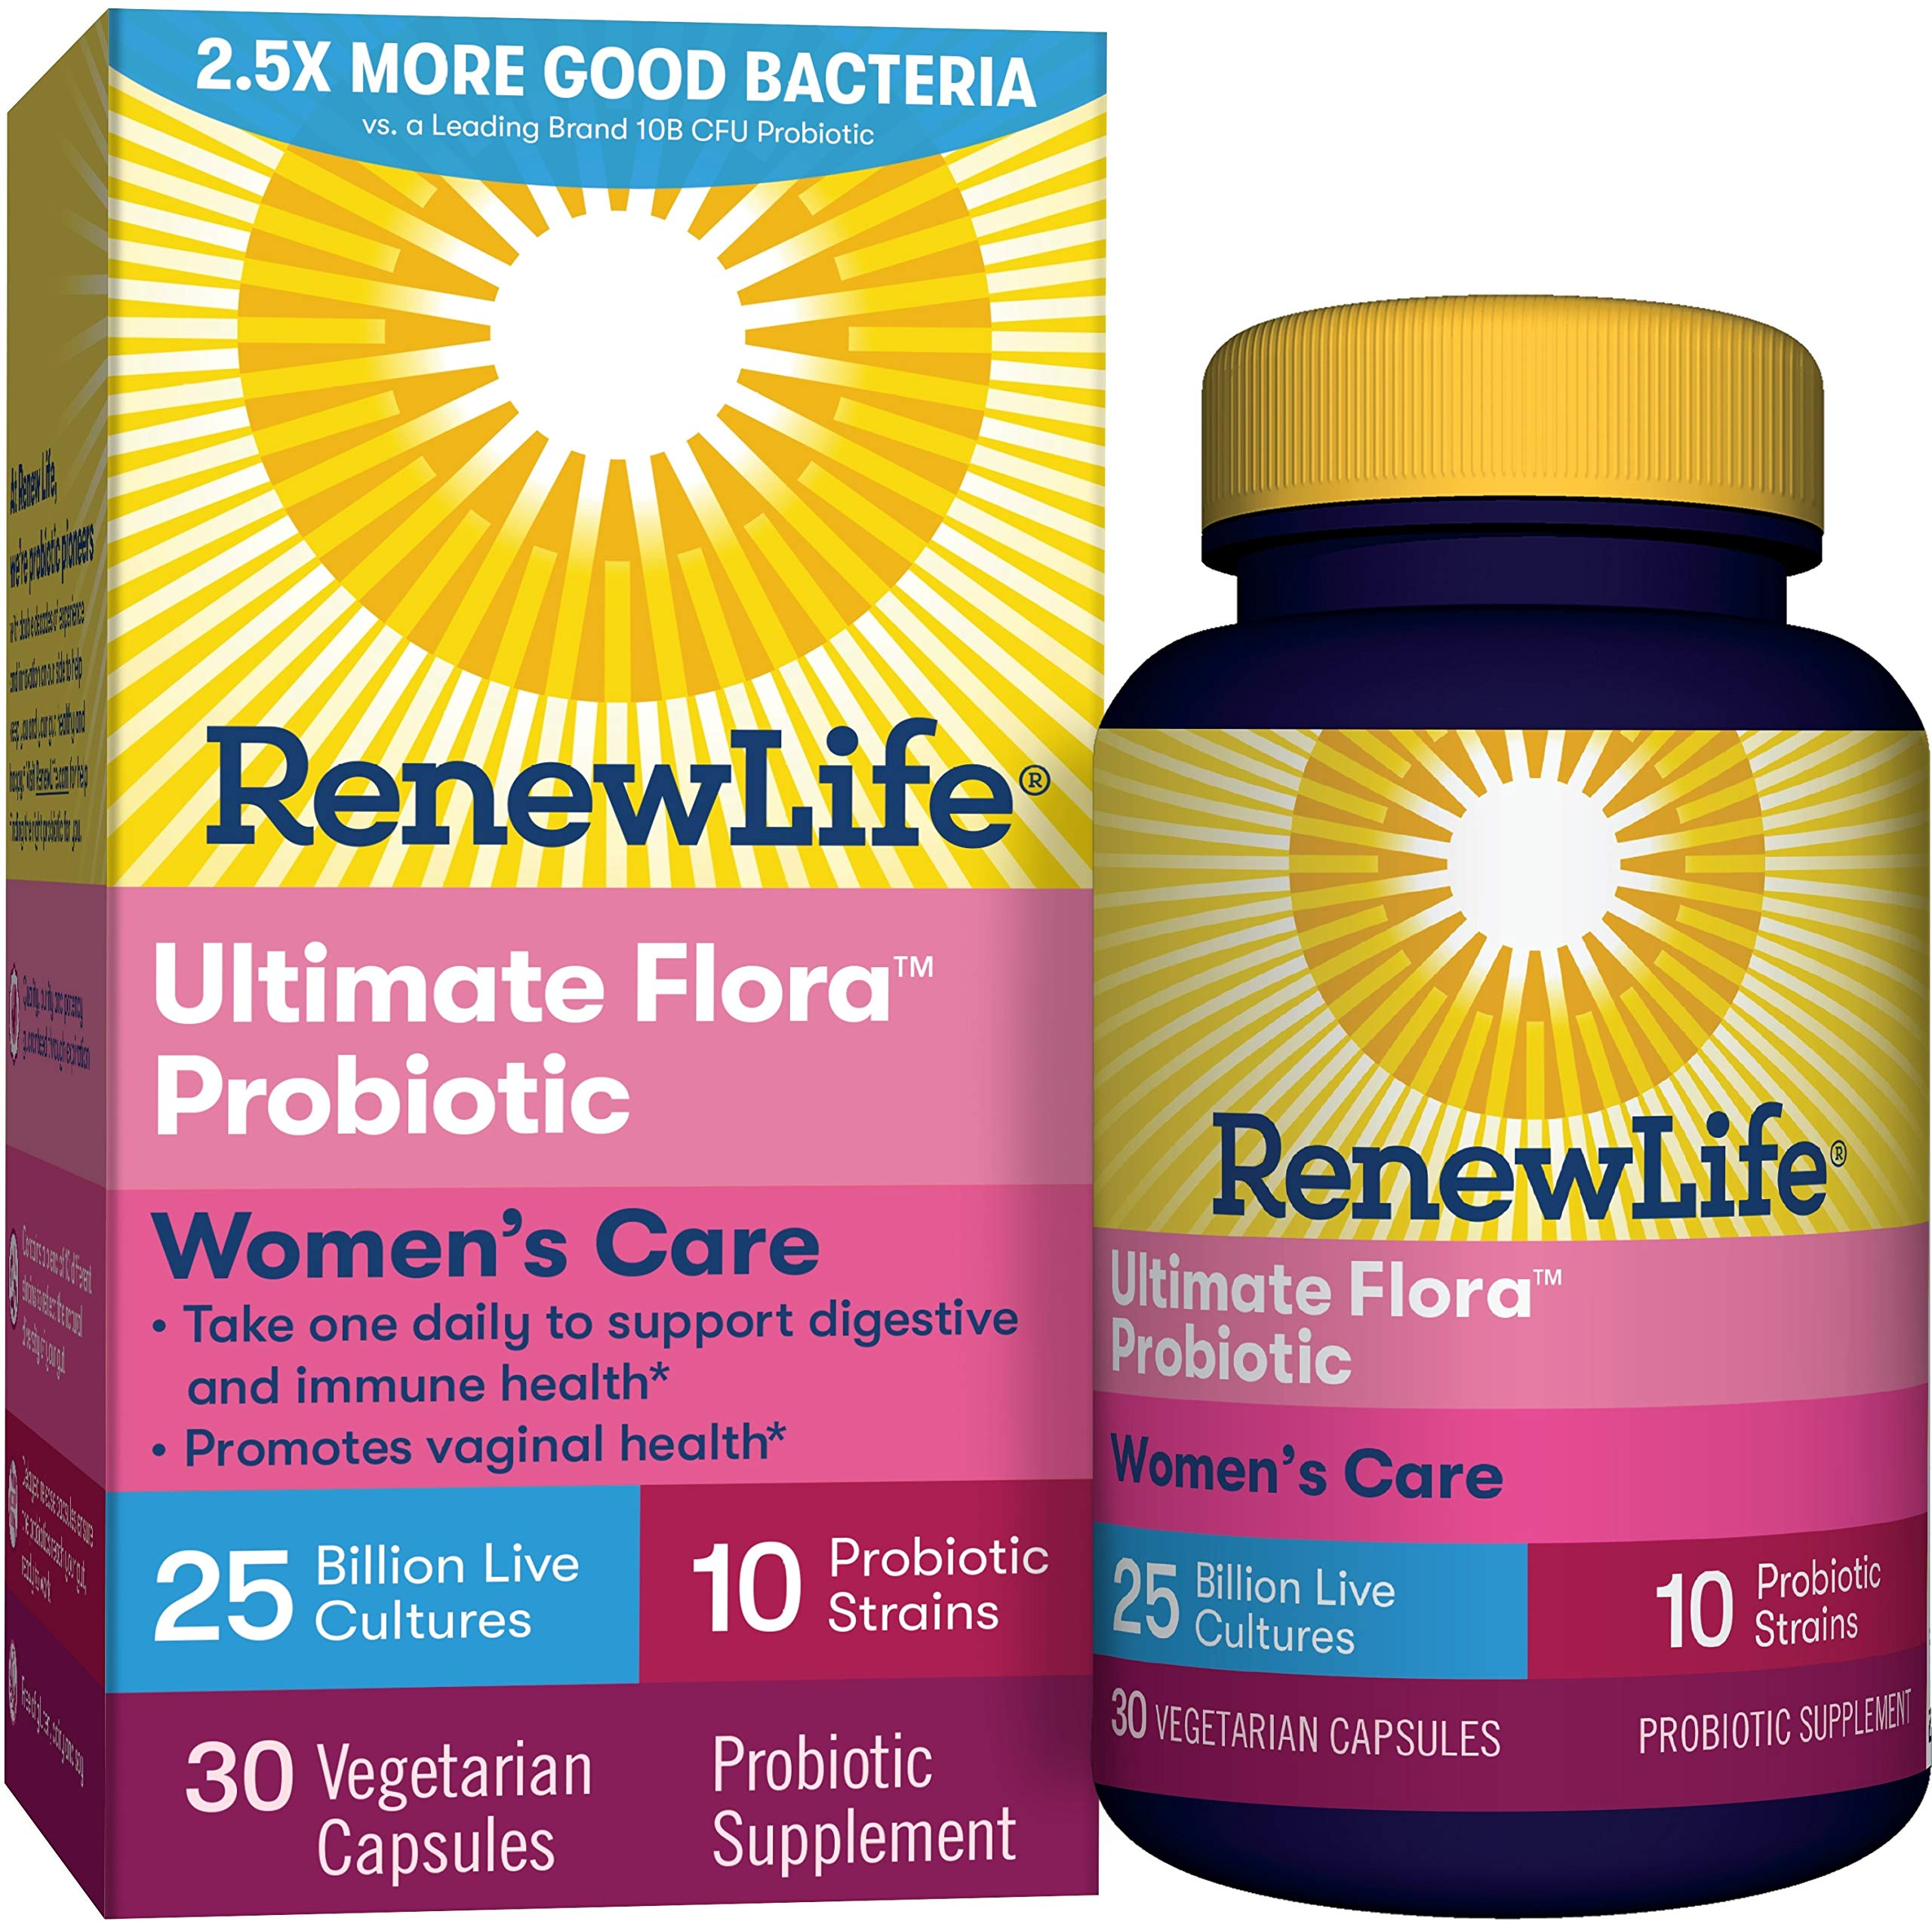 Renew Life #1 Women's Probiotic - Ultimate Flora Women's Care Shelf Stable Probiotic Supplement - Gluten, Dairy & Soy Free - 25 Billion CFU - 30 Vegetarian Capsules by Renew Life